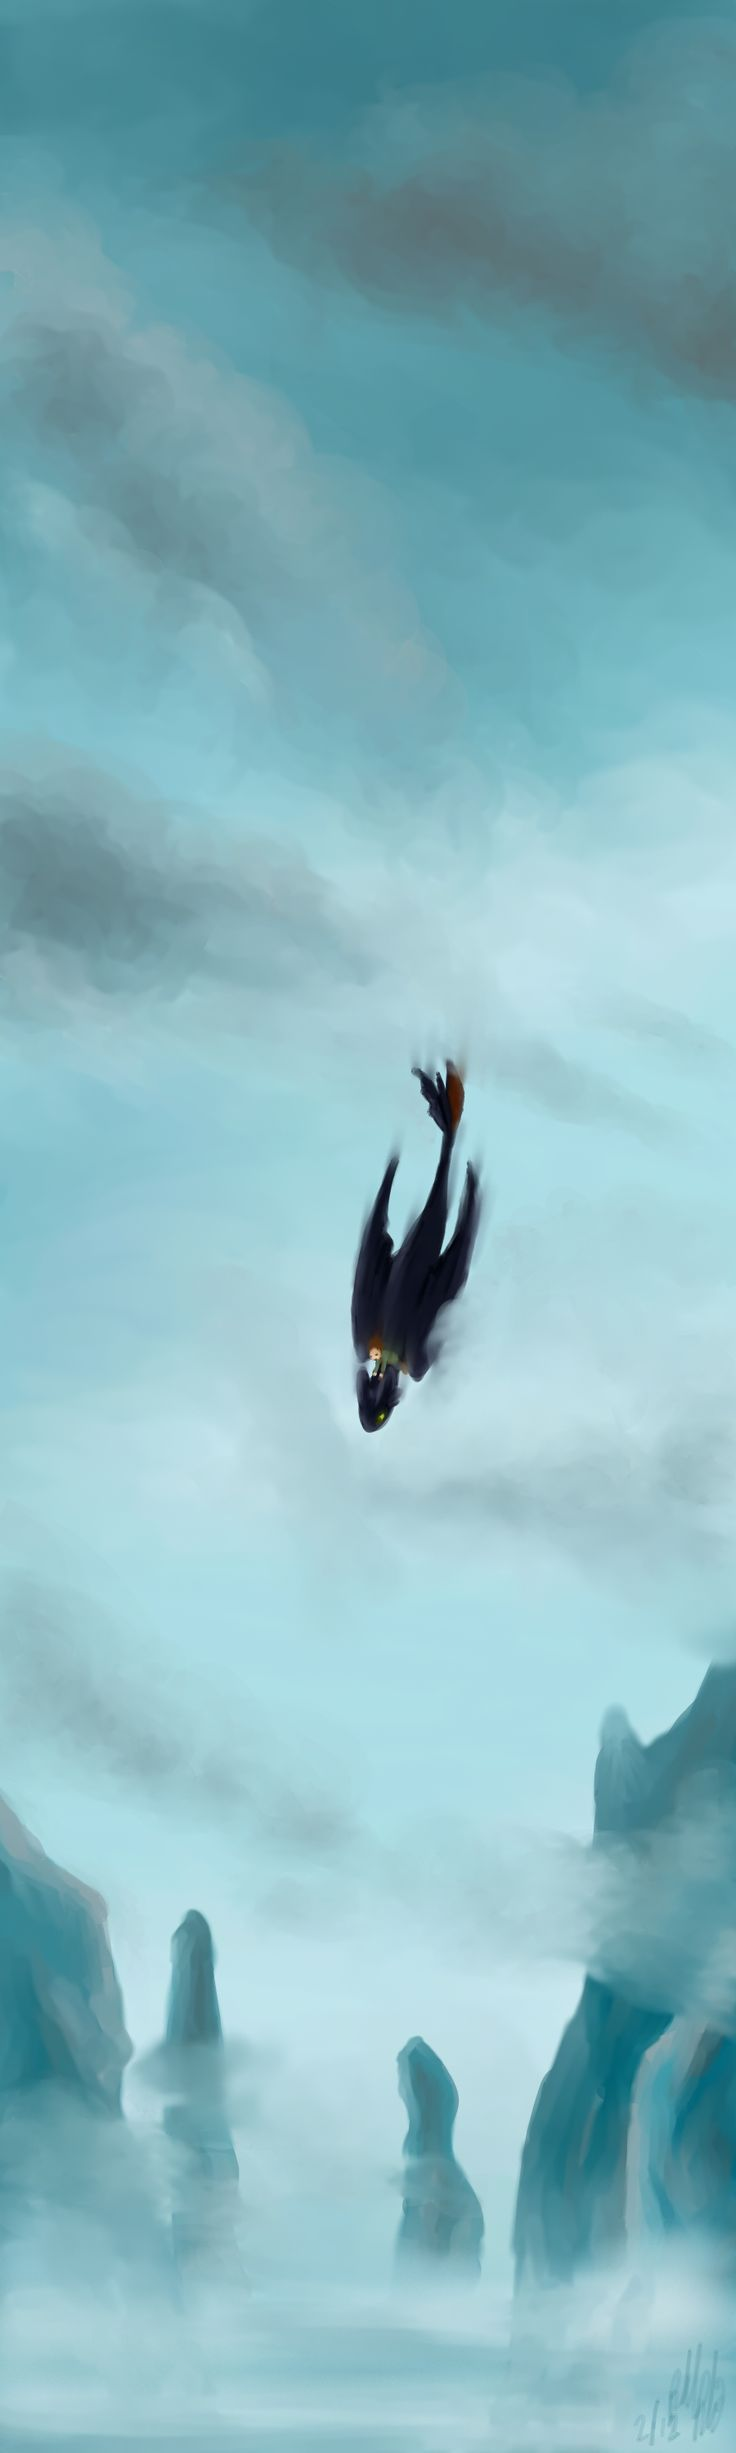 HtTYD-Skydive by Cloudghost.deviantart.com on @deviantART